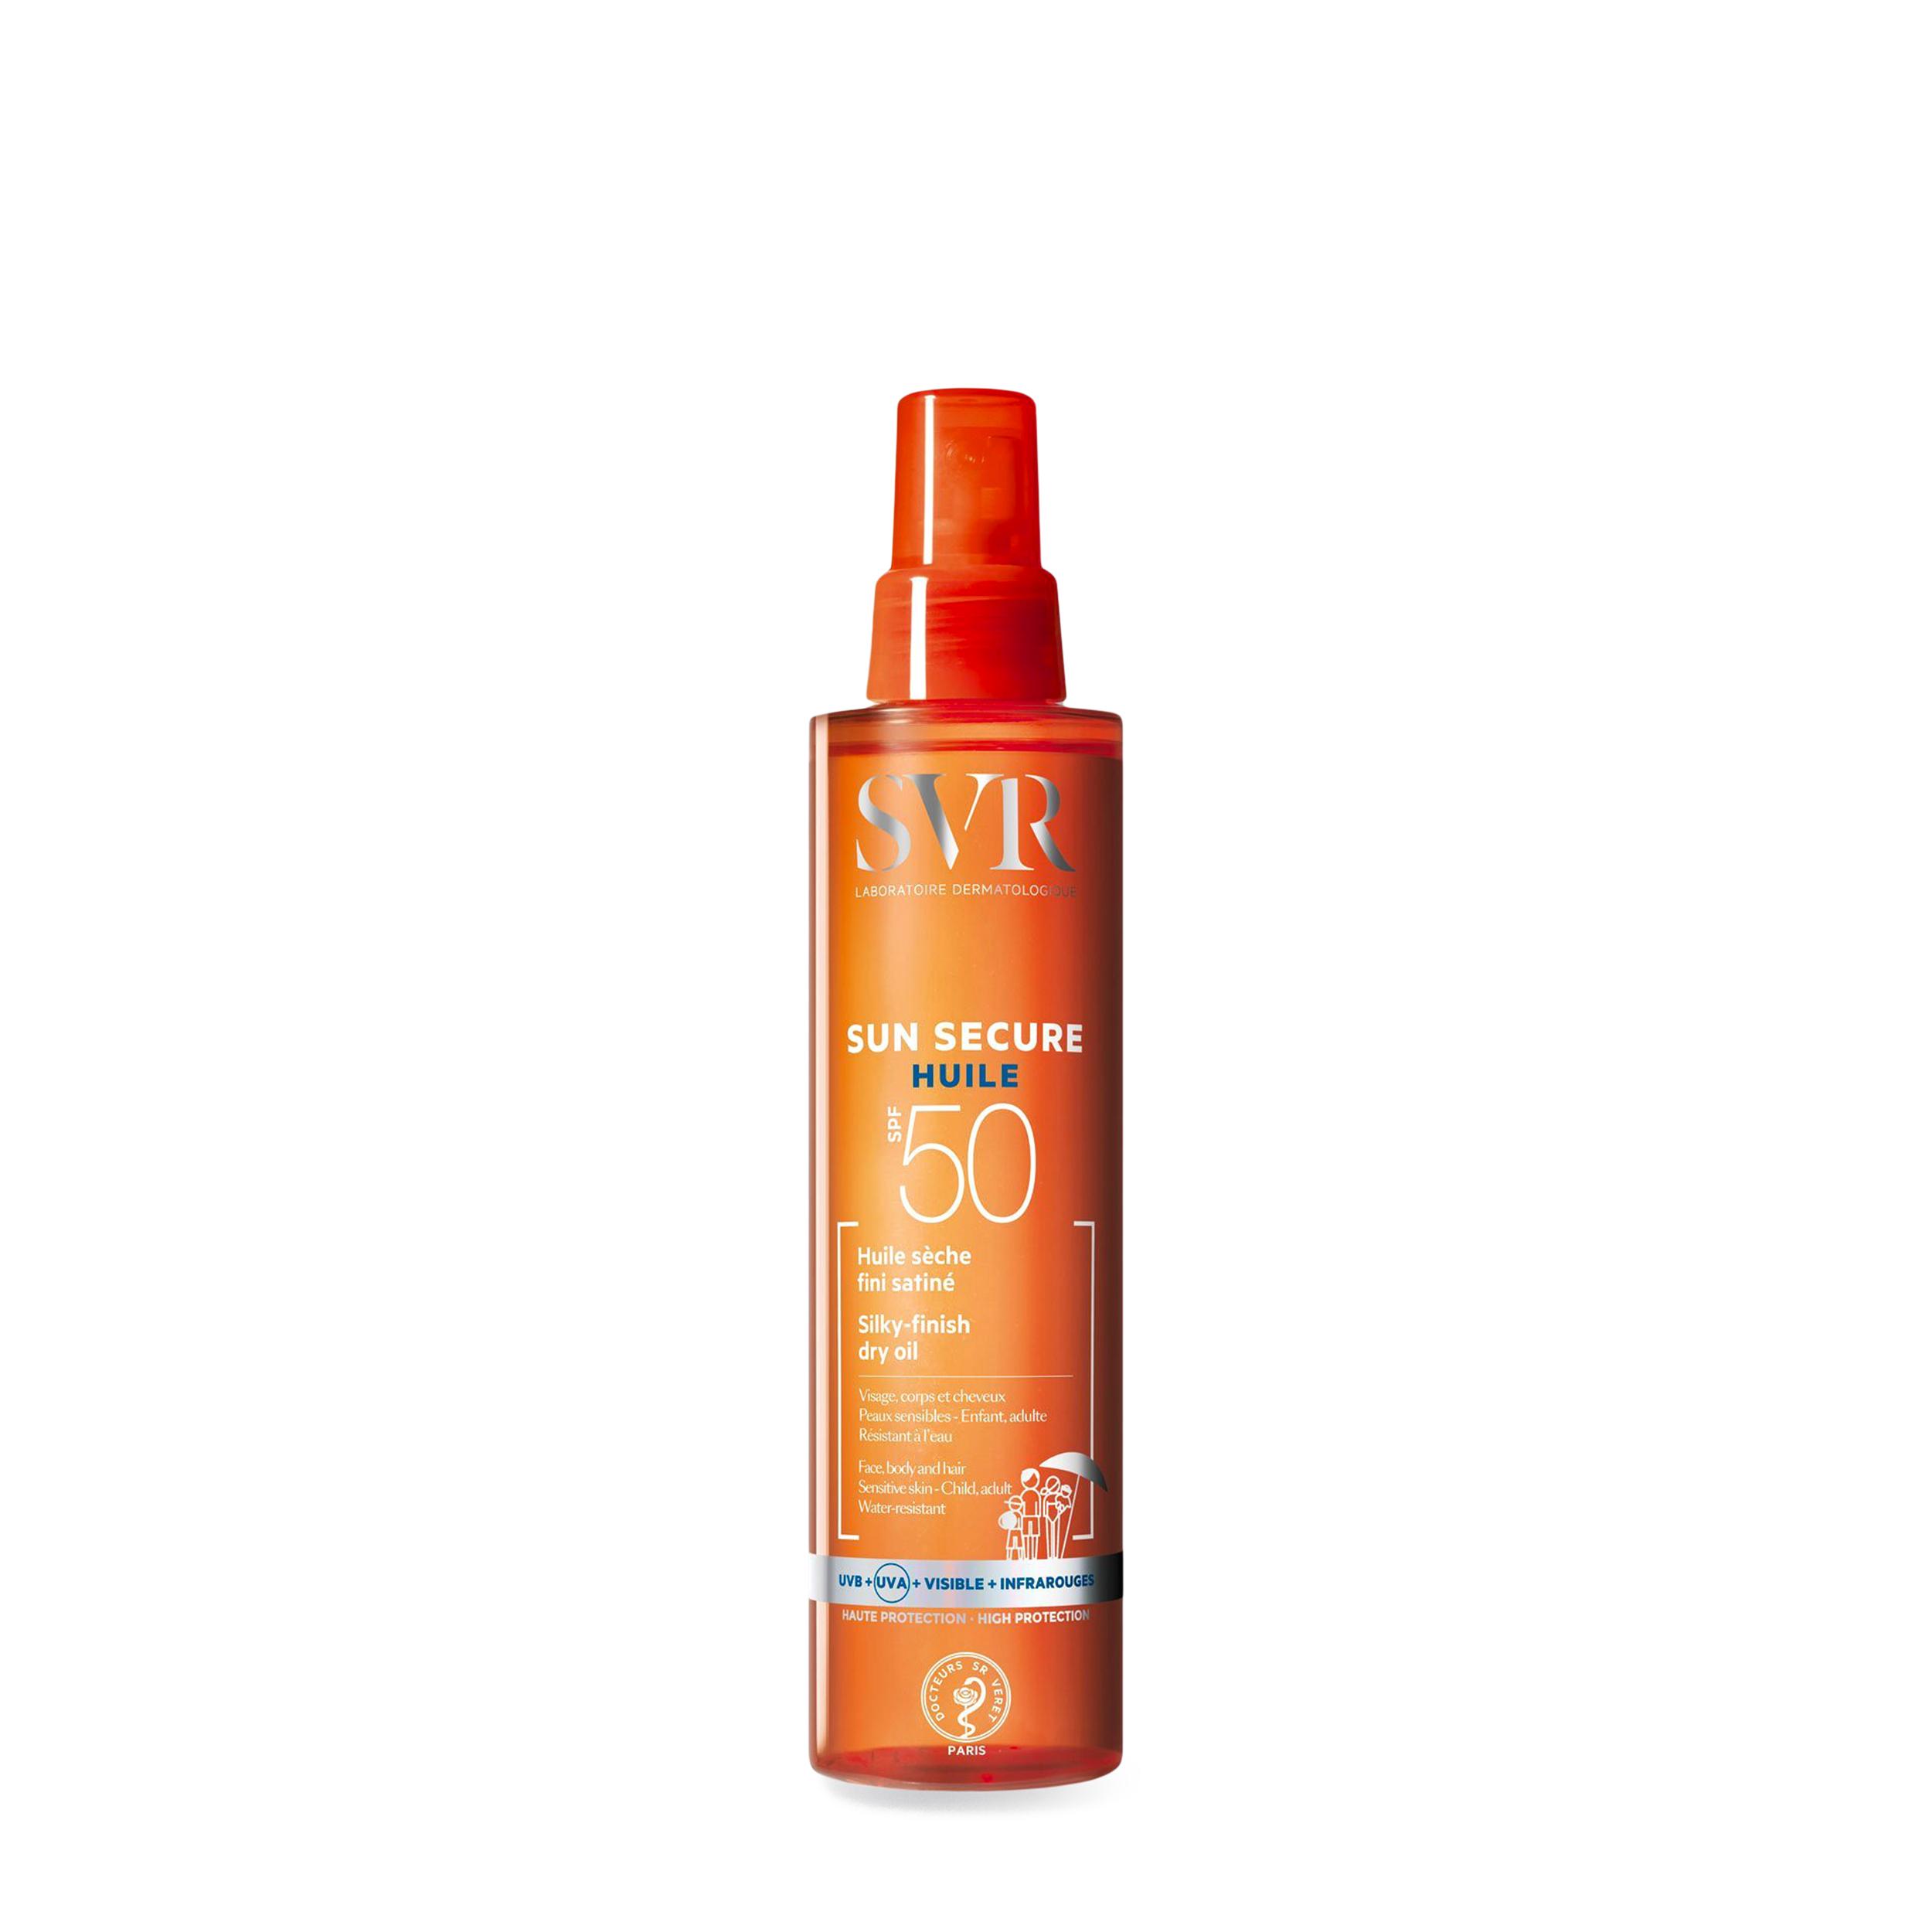 SVR Сухое масло «Sun Secure» SPF50 200 мл фото